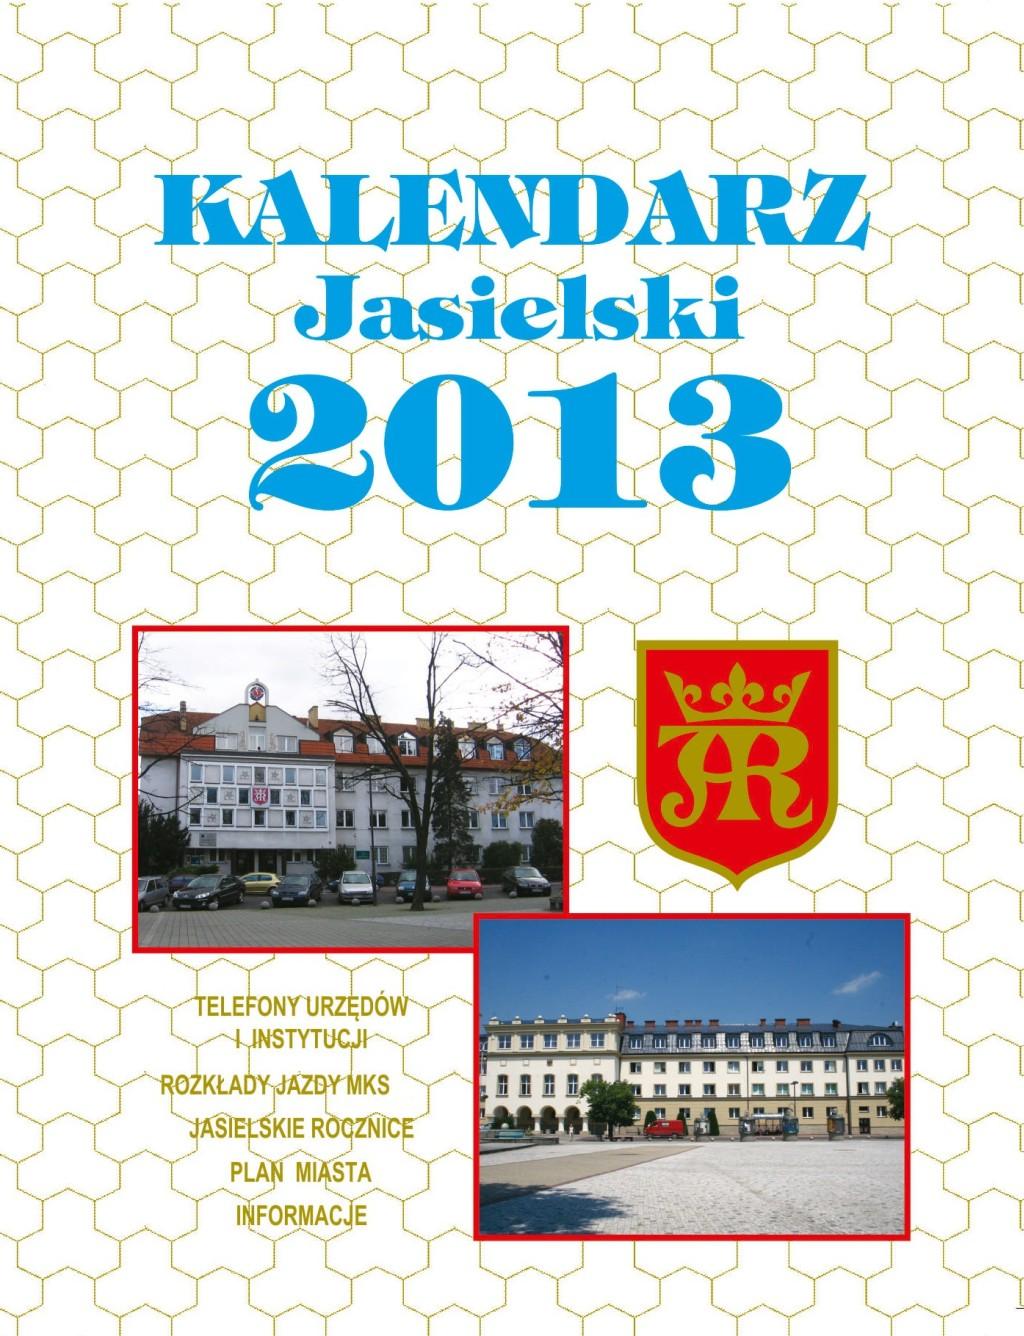 Okładka nowego kalendarza